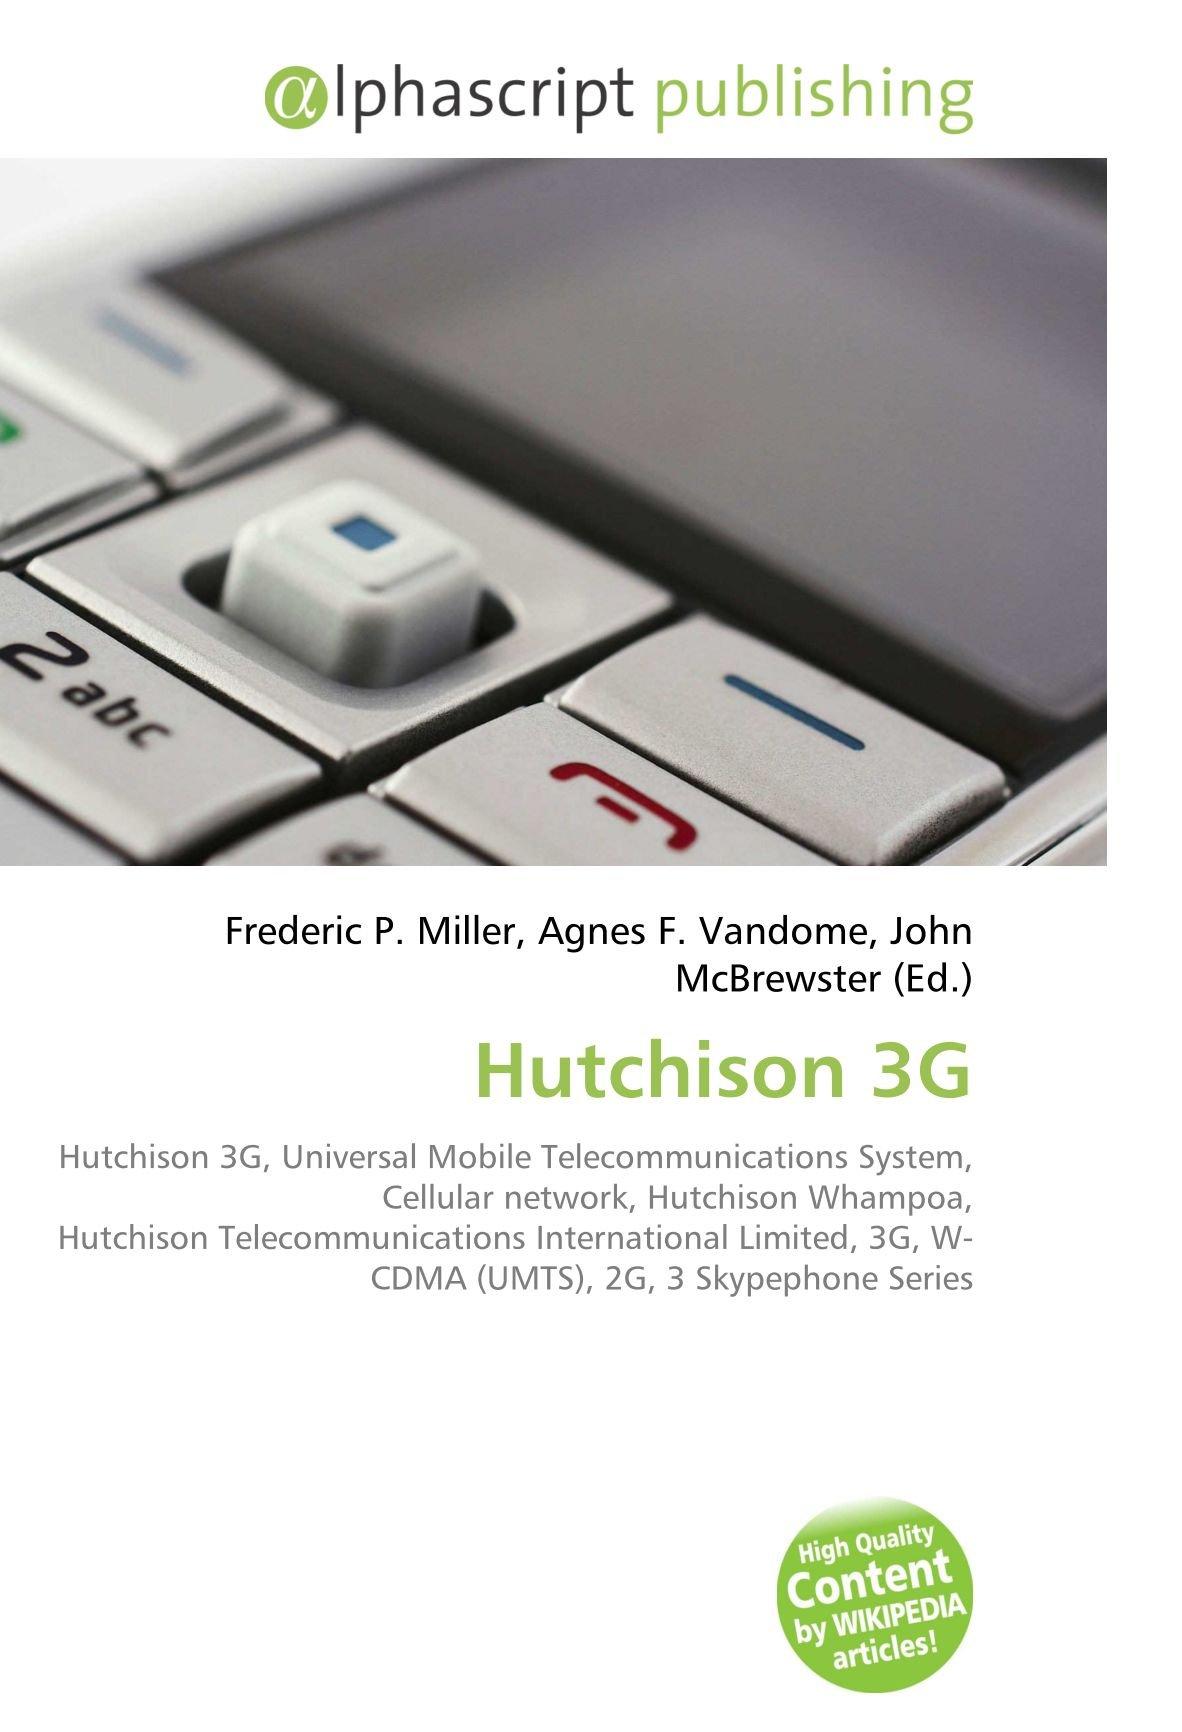 Amazon fr - Hutchison 3G: Hutchison 3G, Universal Mobile